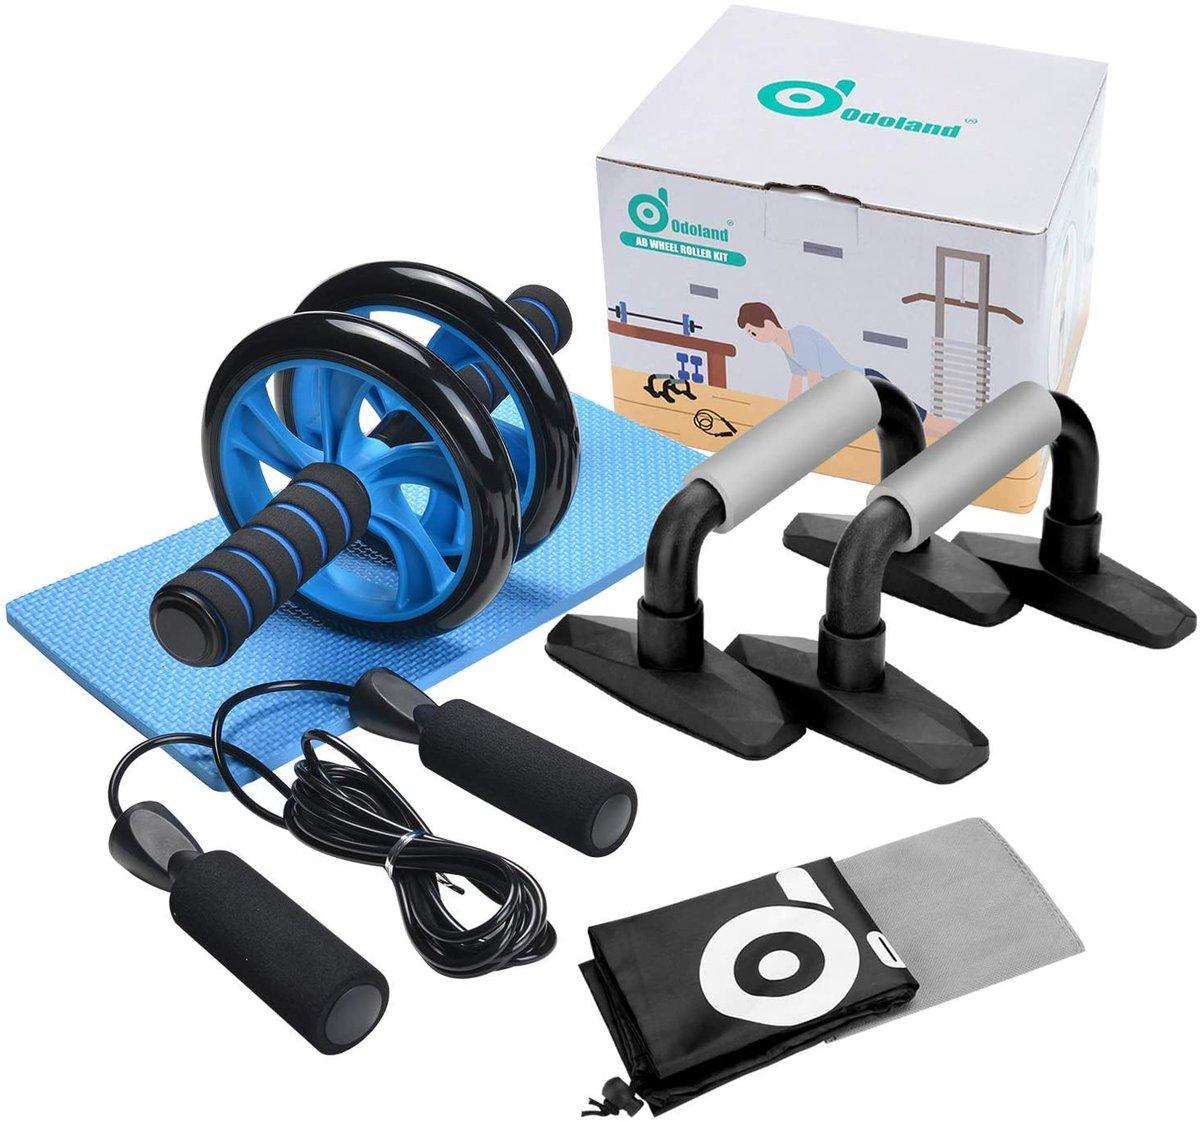 Perfect Home Workout Kit only $34.99!! 🔥🔥    https://t.co/FXXWp6UUa3    #freebies #deals #deal #moneysaver #greatdeal #steals #discount #sale #bargain #bargainhunter #cheap #bestprice #AmazonDeals #giveaway https://t.co/CANRcooONQ